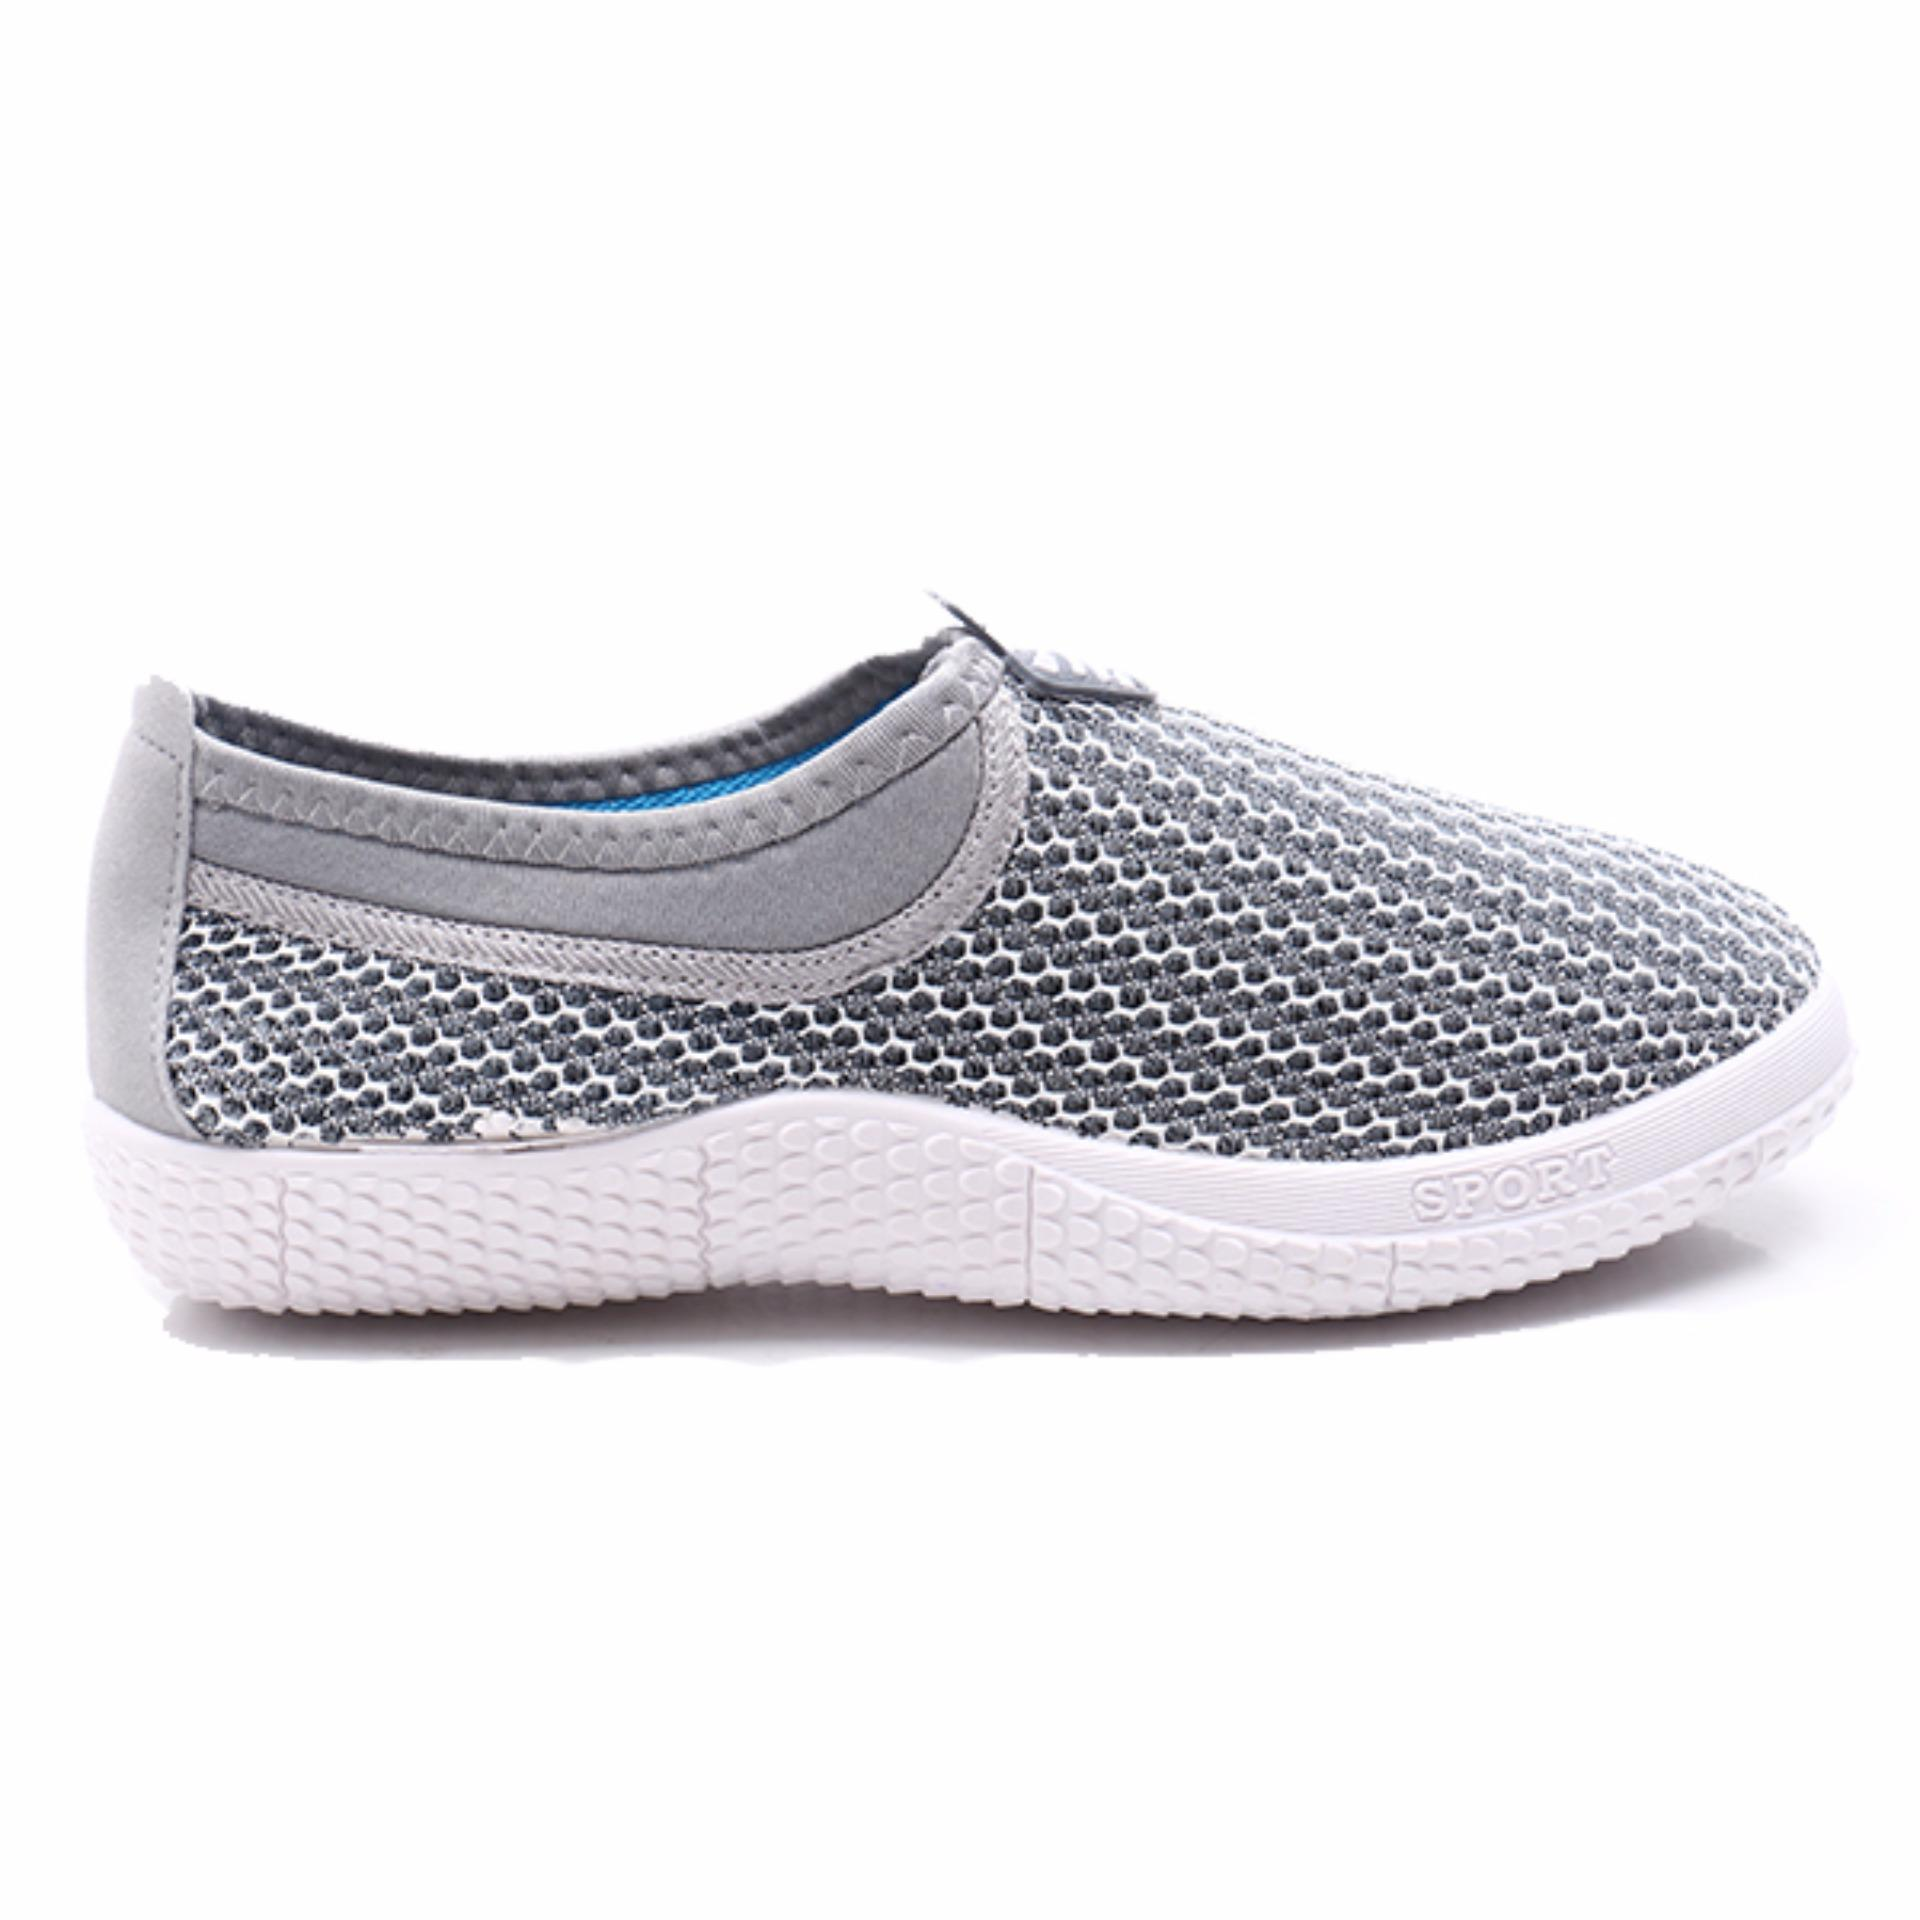 Dr Kevin Women Flat Slip On Shoes 43104 Blue Spec Dan Daftar Harga Sandals 43224 Biru 39 Sneakers 43213 Grey